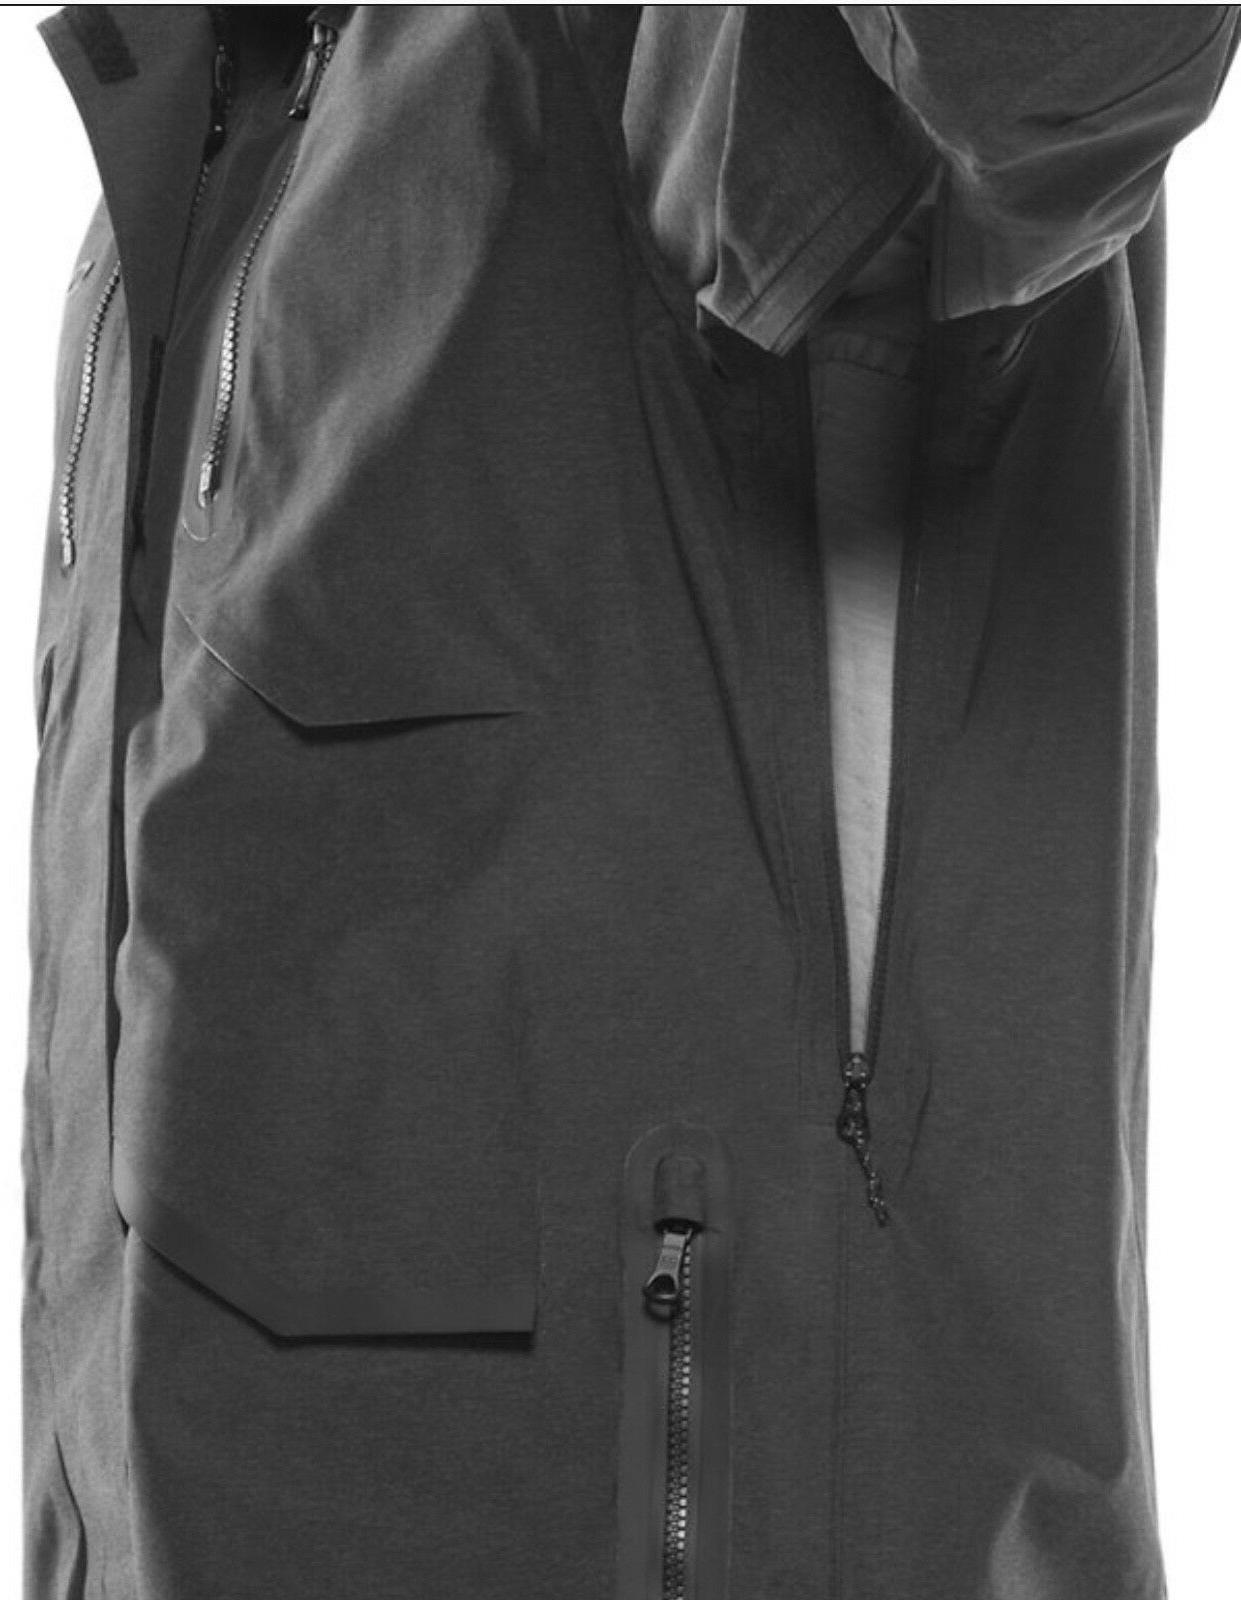 Oakley Jacket Men's Ski MSRP $280